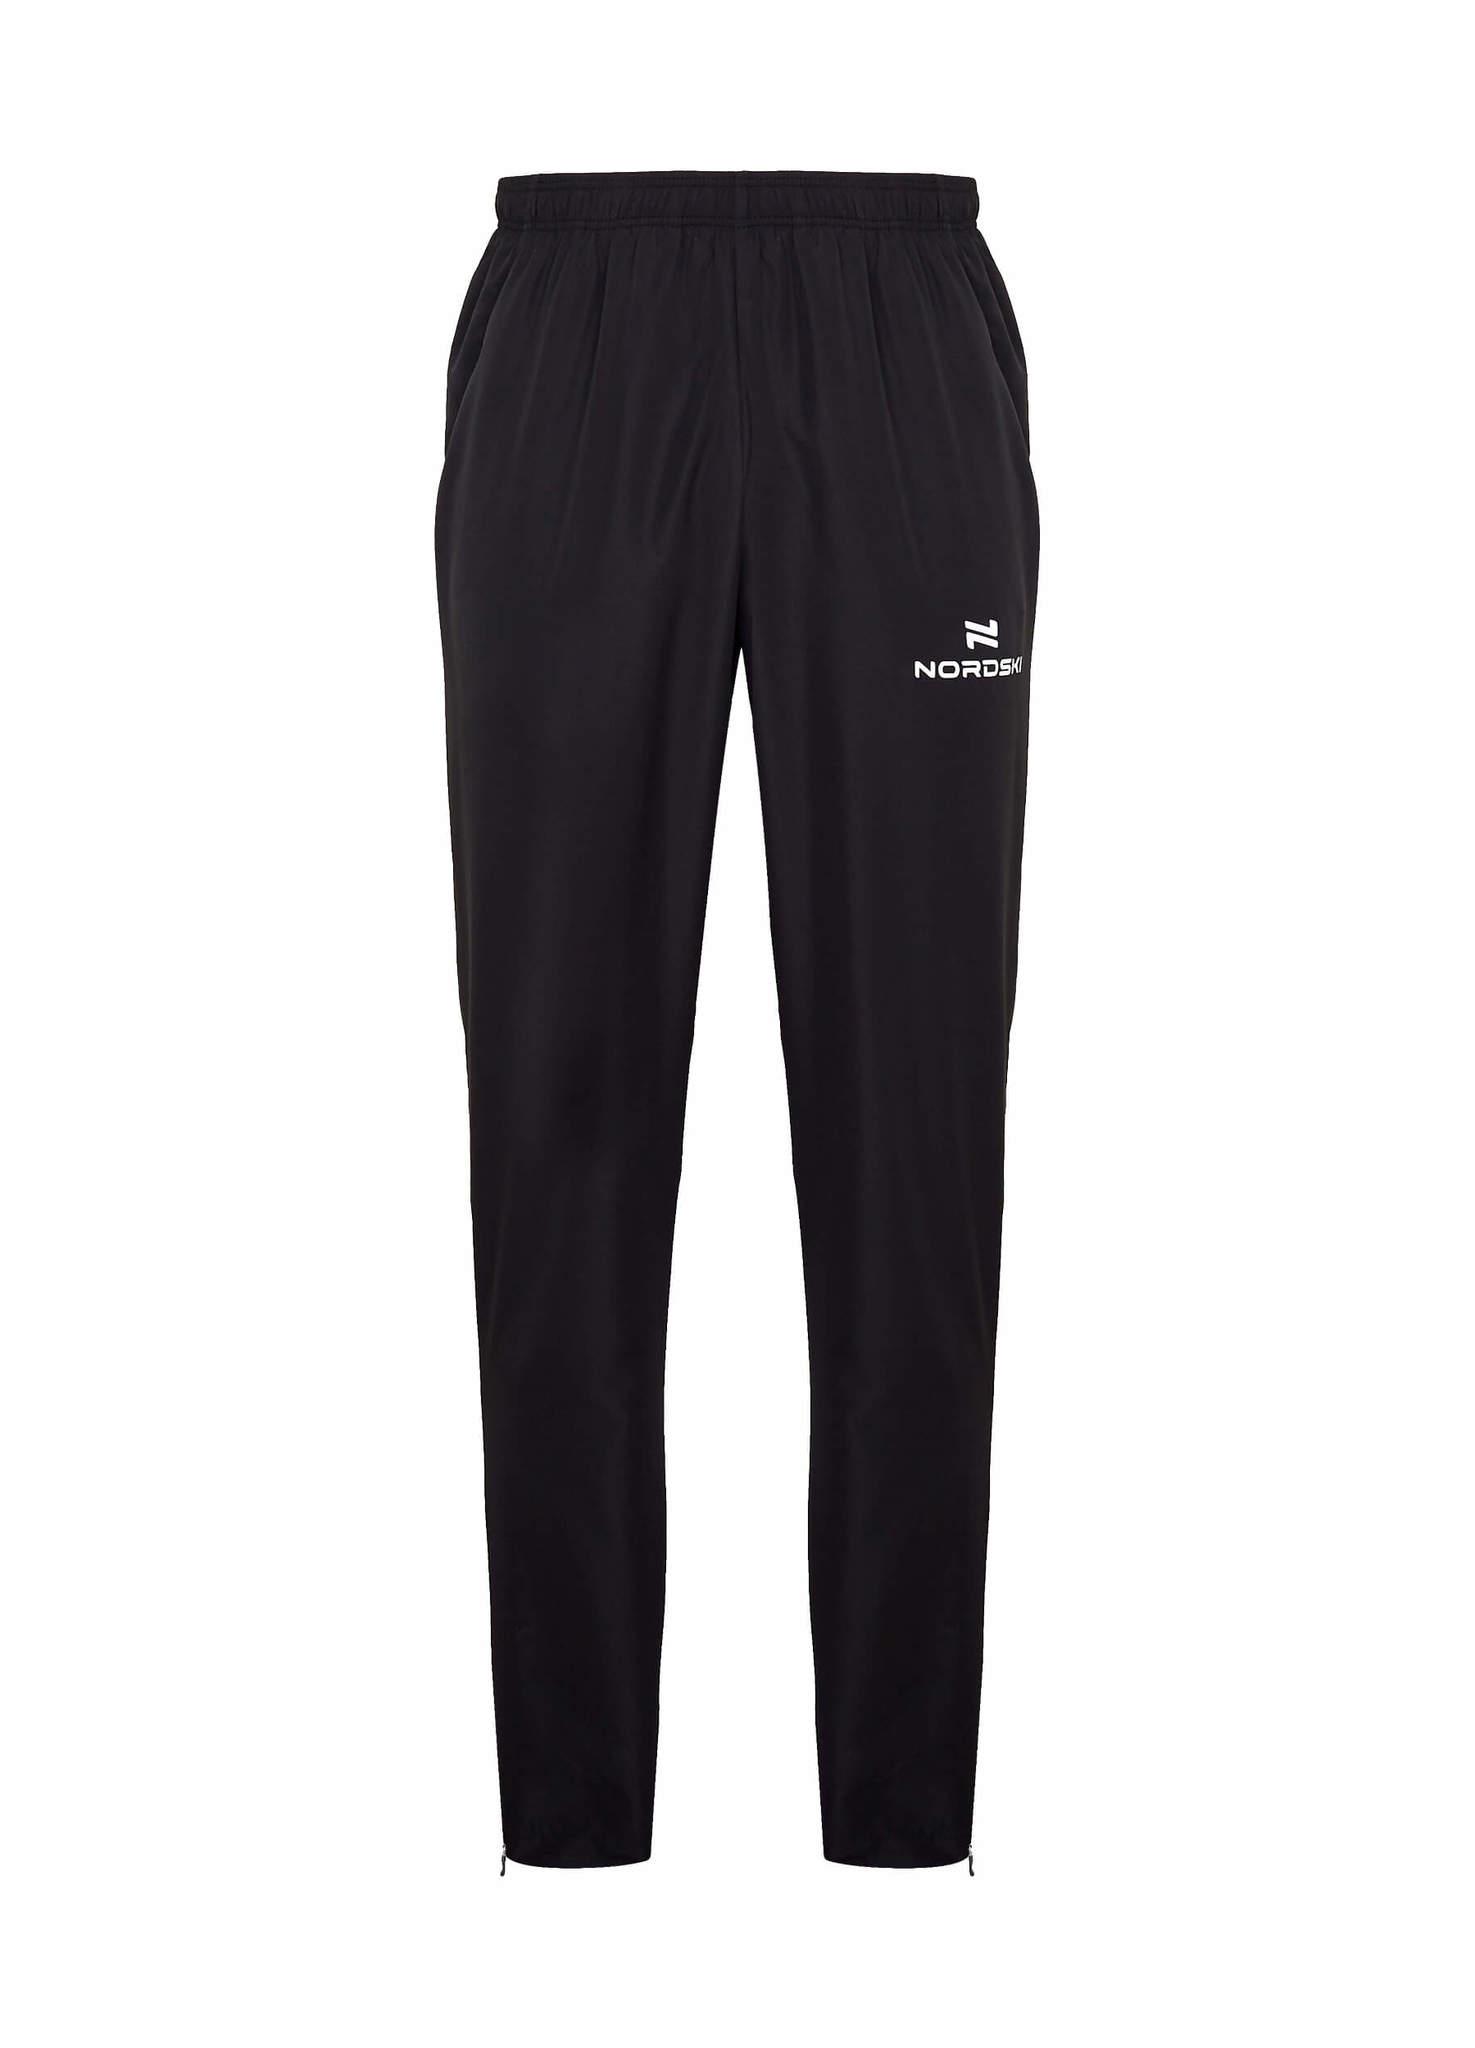 Nordski Motion брюки женские Black - 8